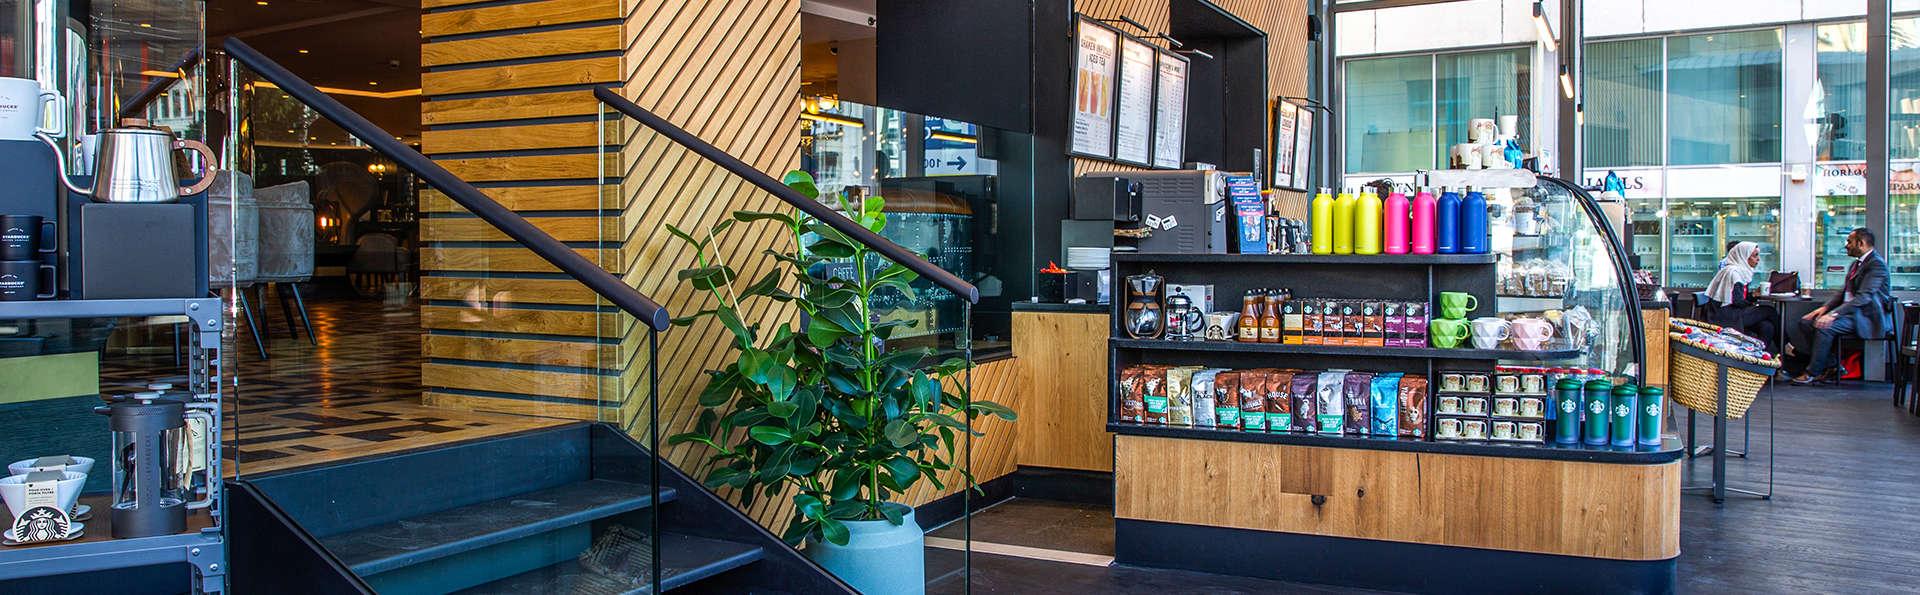 Radisson Blu Astrid Hotel - EDIT_Radisson_Blu_Astrid_Antwerp_-_Starbucks_01.jpg